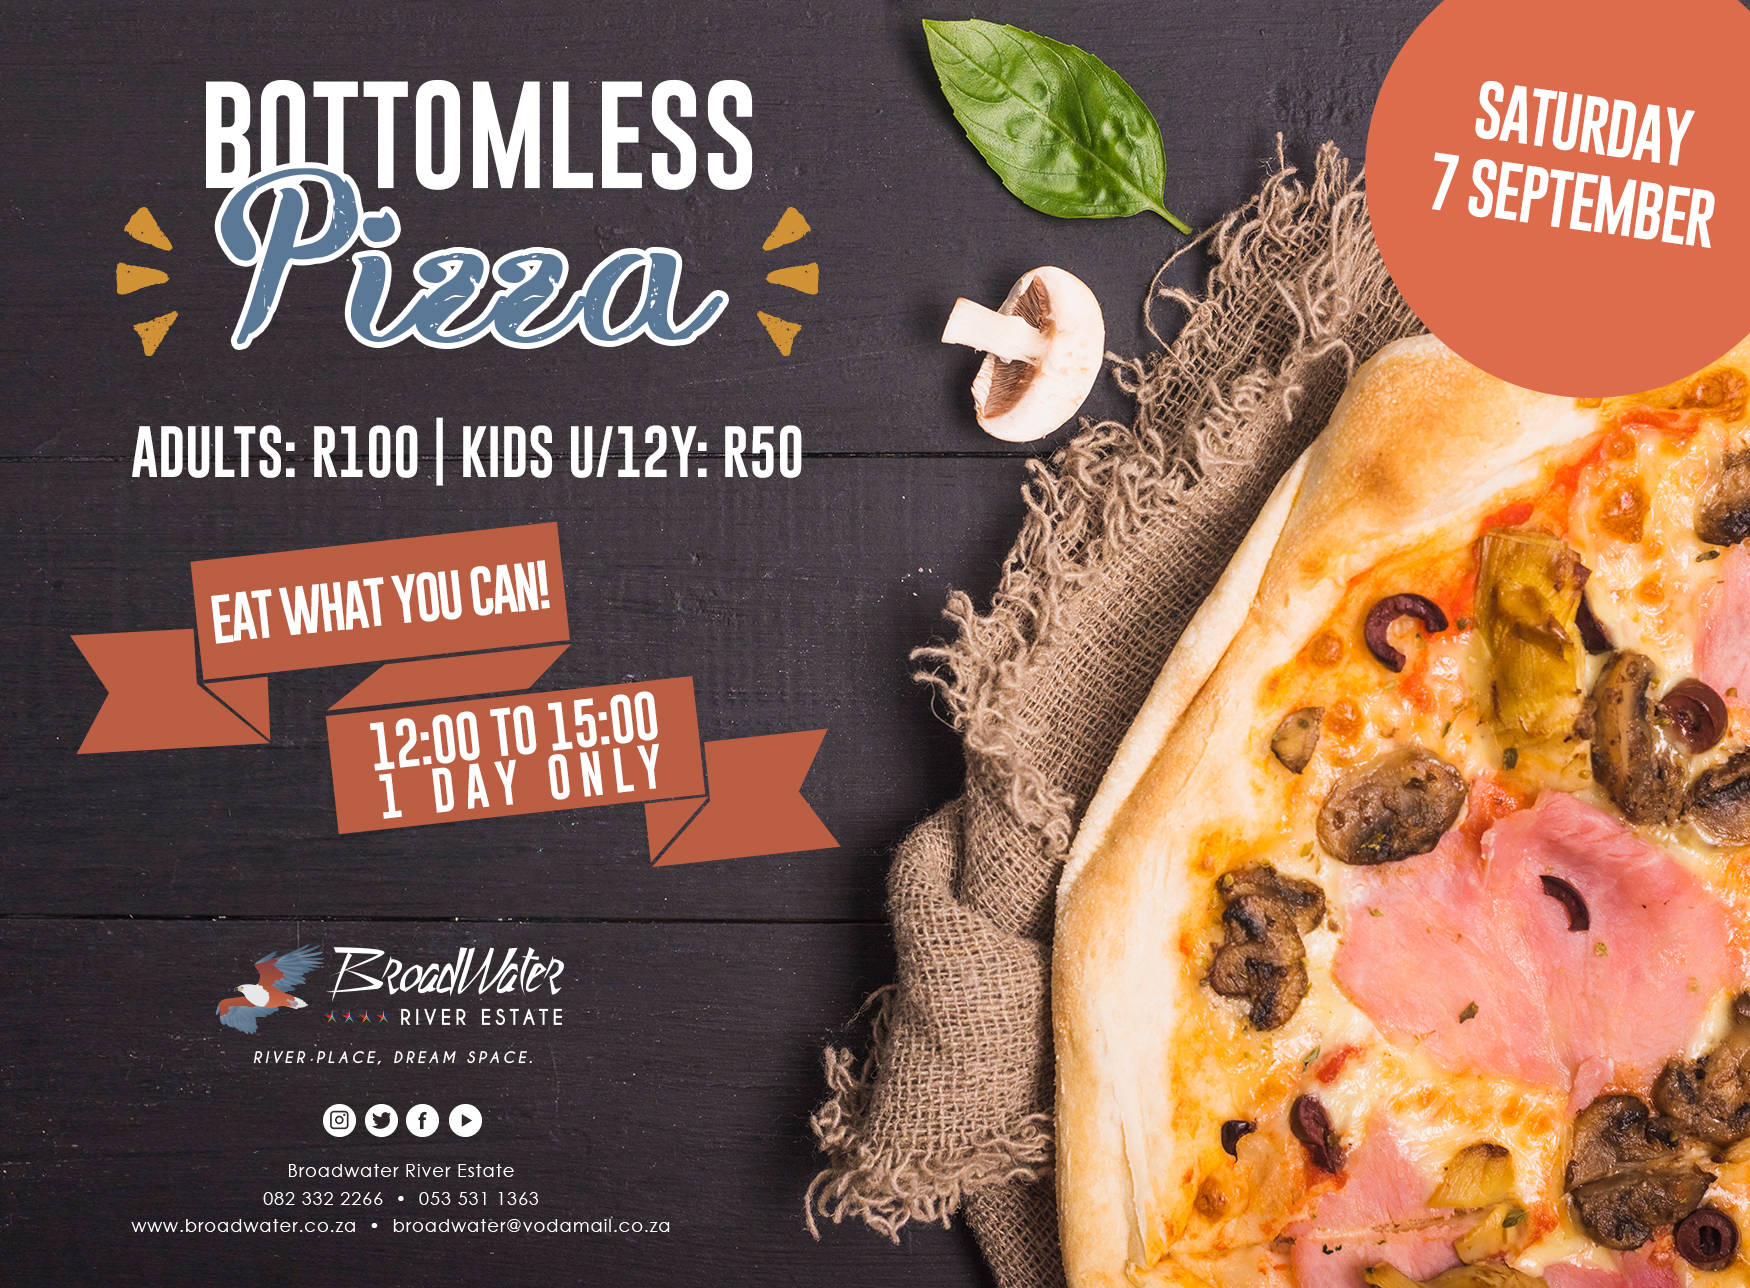 bottomless pizza on saturdays